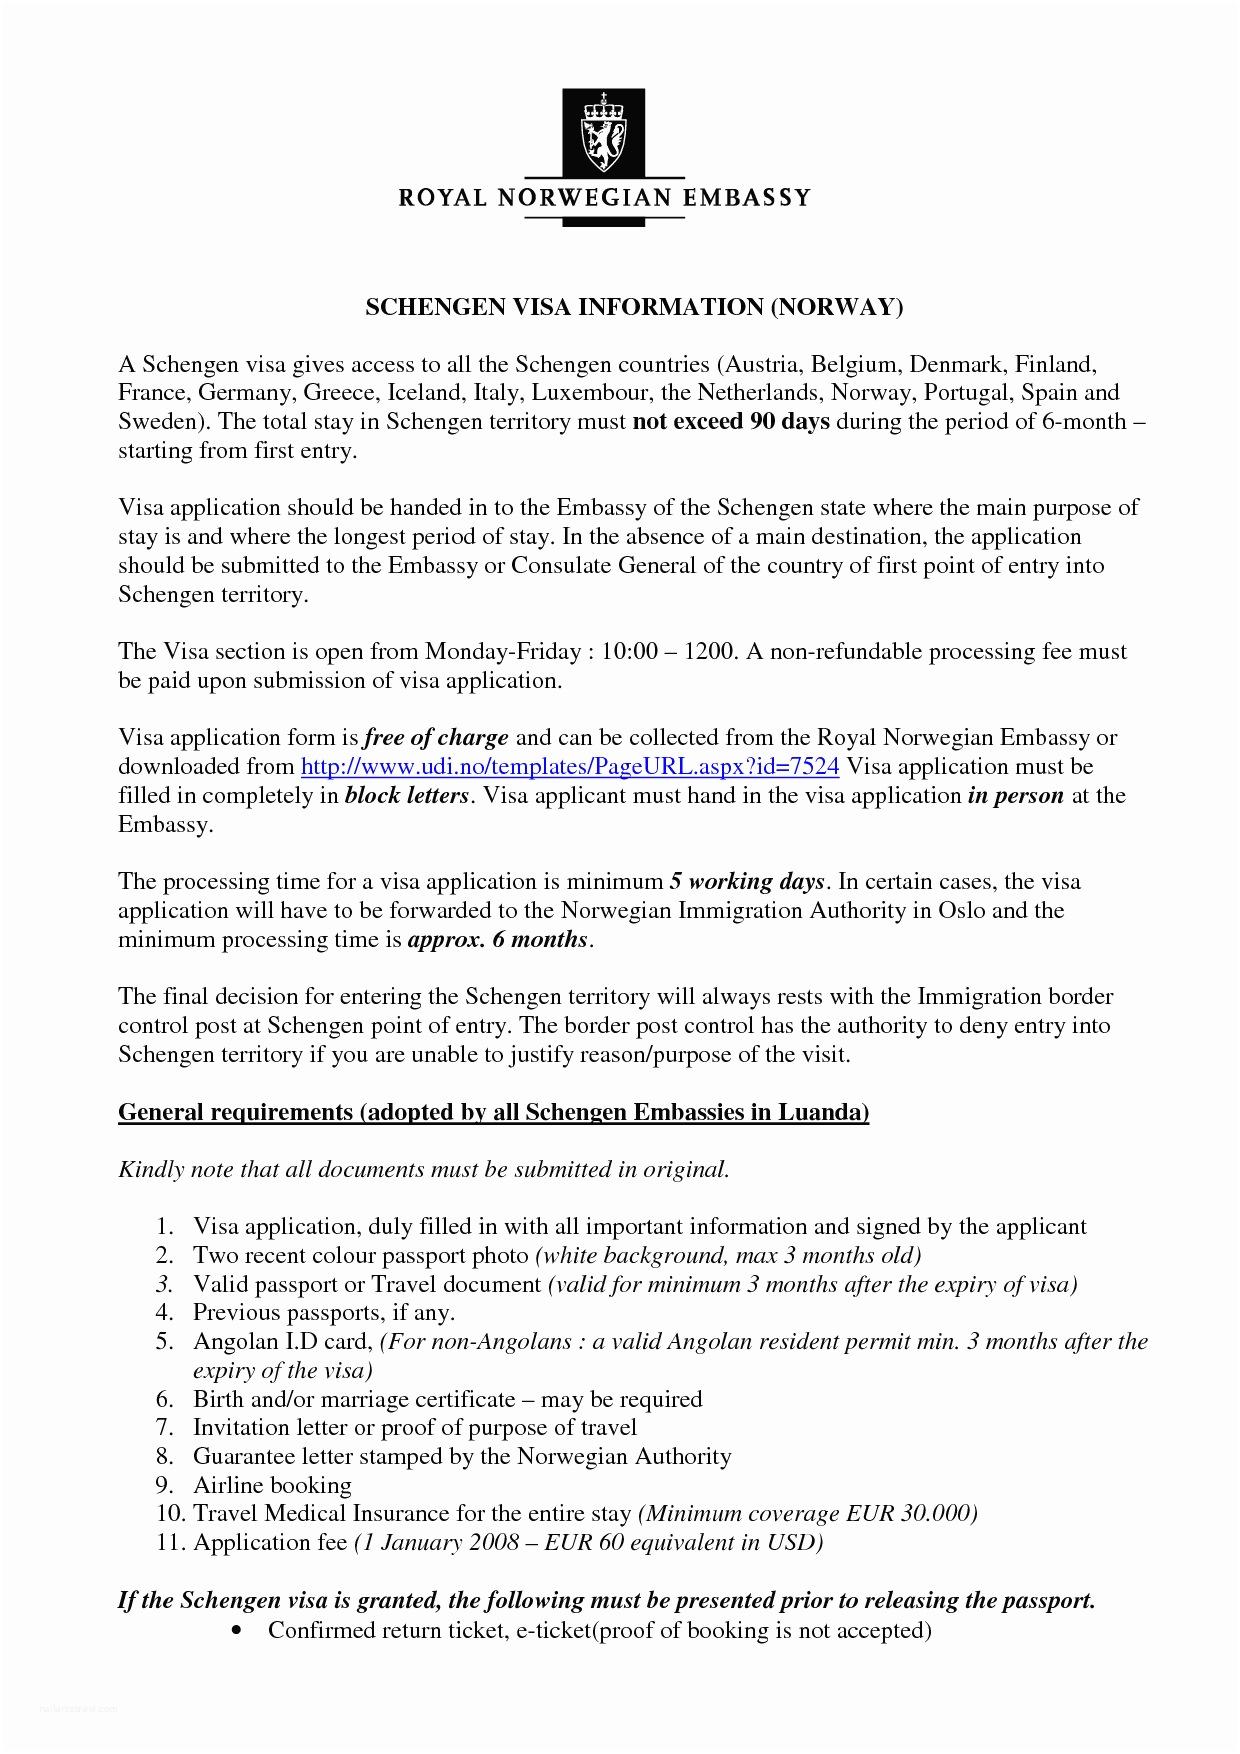 Wedding Invitation form Free Invitation Letter format for Schengen Visa Letter